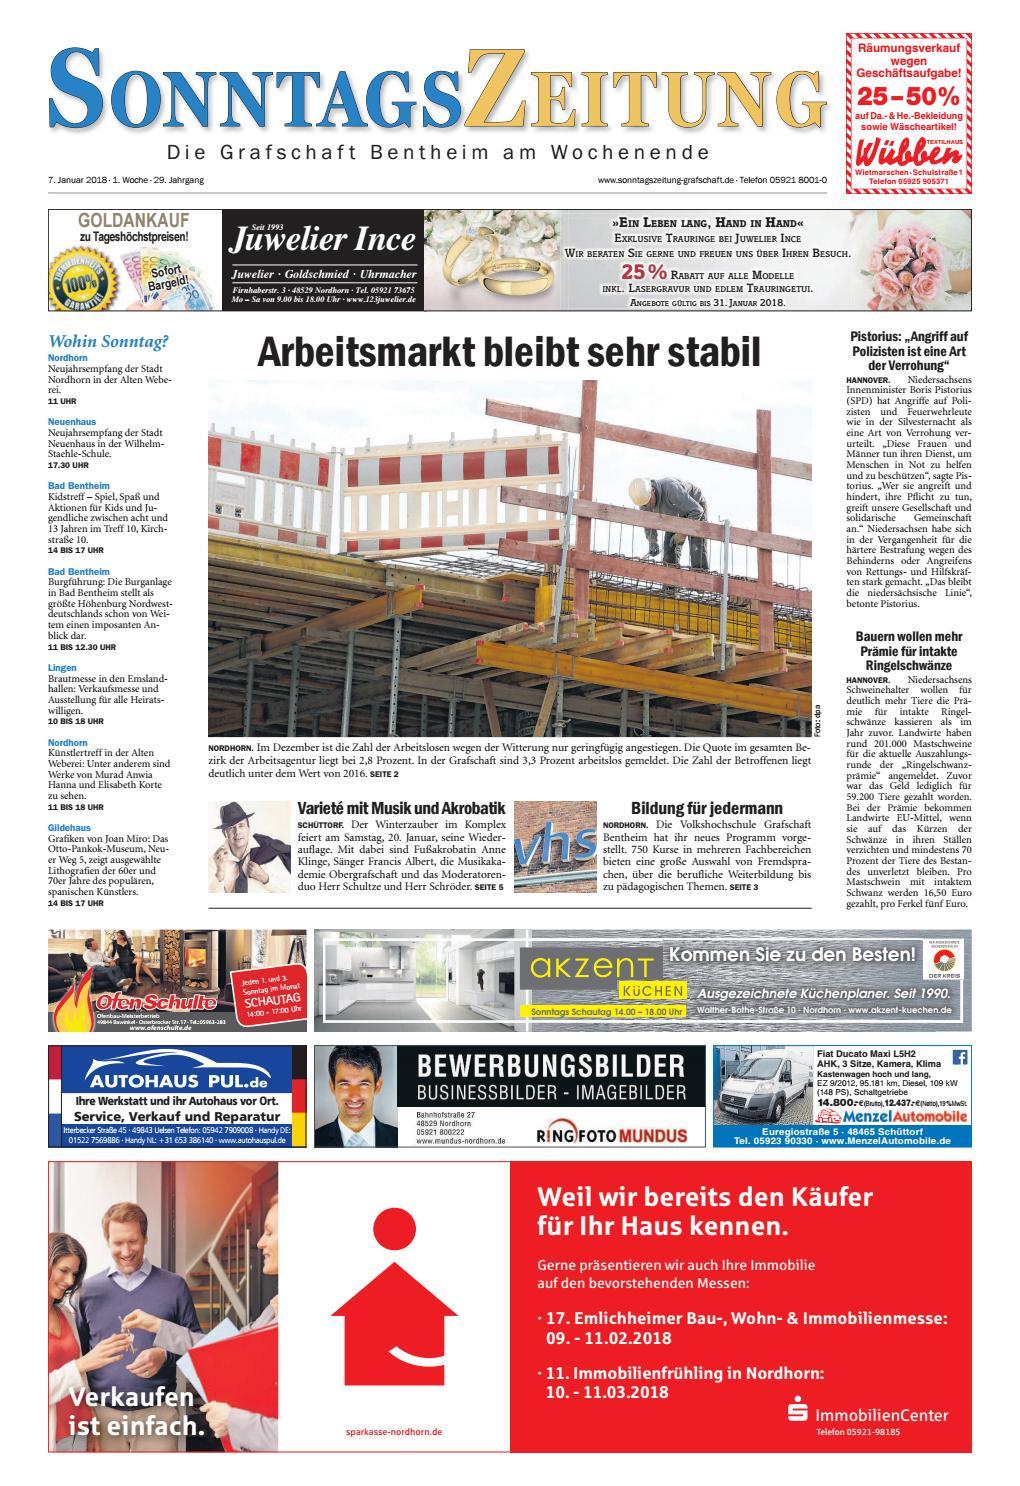 Sonntagszeitung 7 1 2018 By Sonntagszeitung Issuu